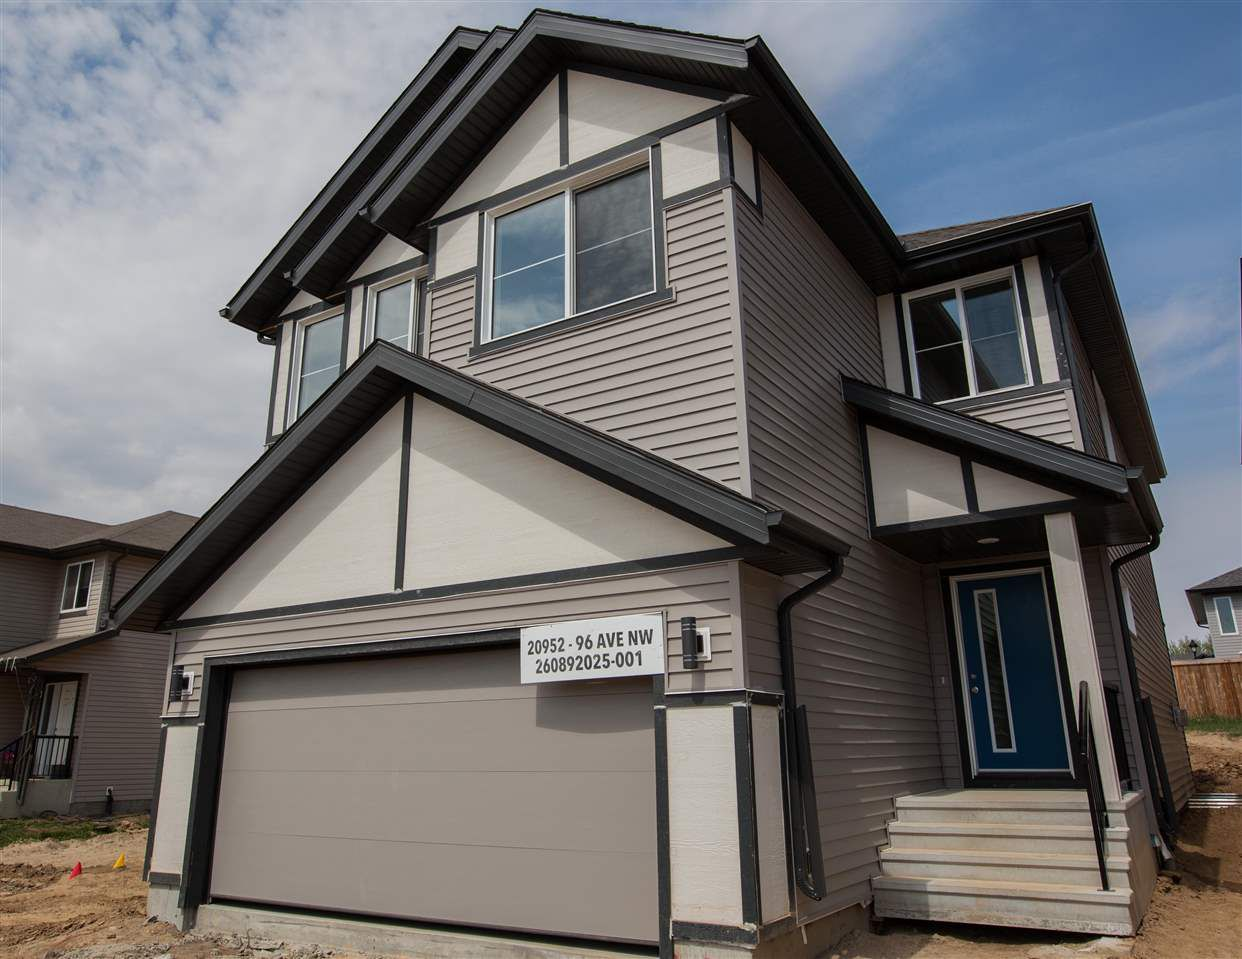 Main Photo: 20952 96 Avenue in Edmonton: Zone 58 House for sale : MLS®# E4143343